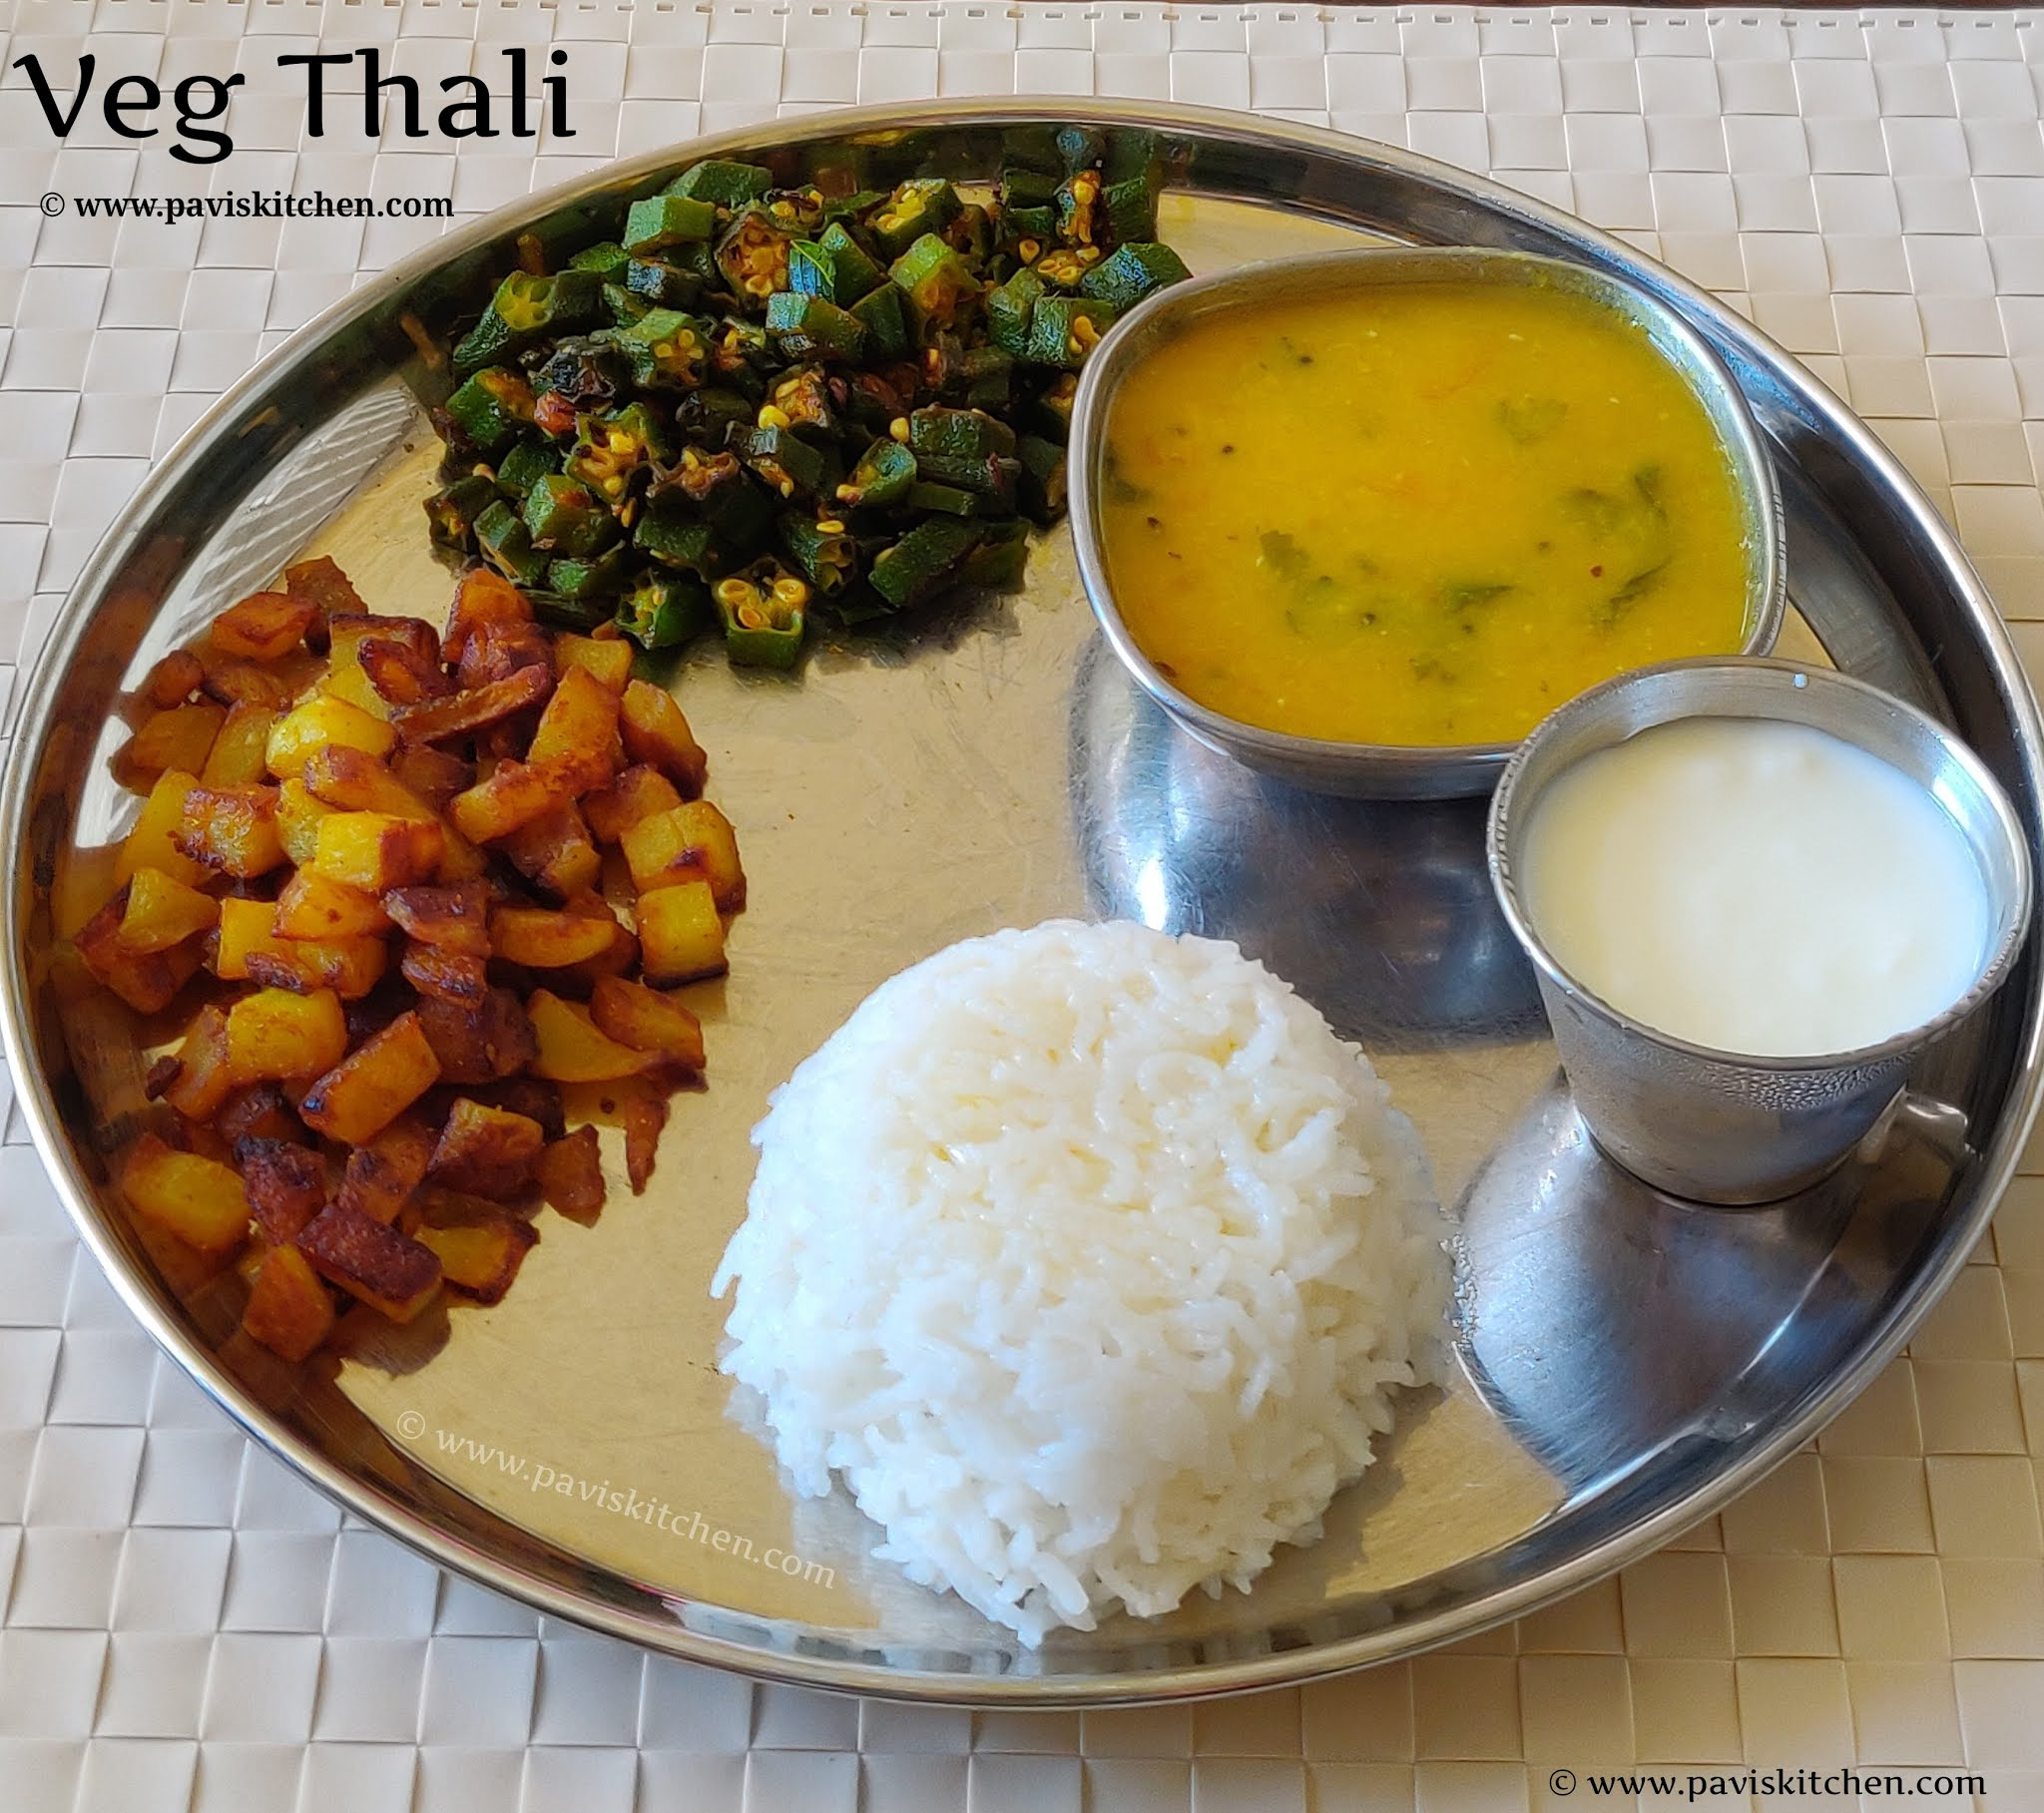 South Indian thali | Satvik thali recipe | Lunch thali recipes | Indian veg thali